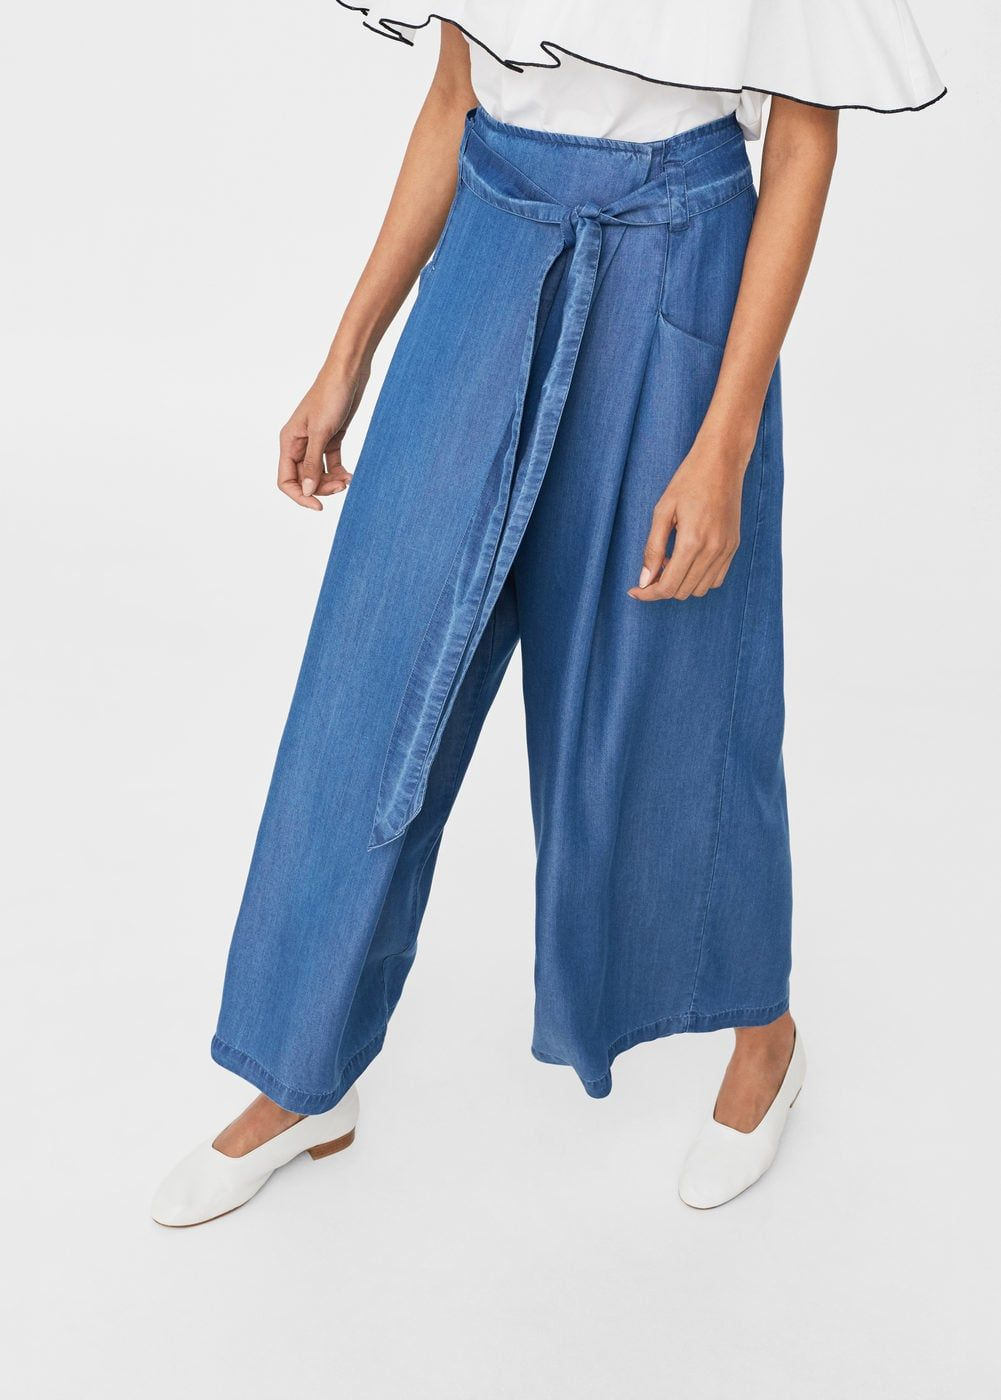 2c425732d77 Pantalón soft cordón - Mujer en 2019   MANGO   Pantalones ...